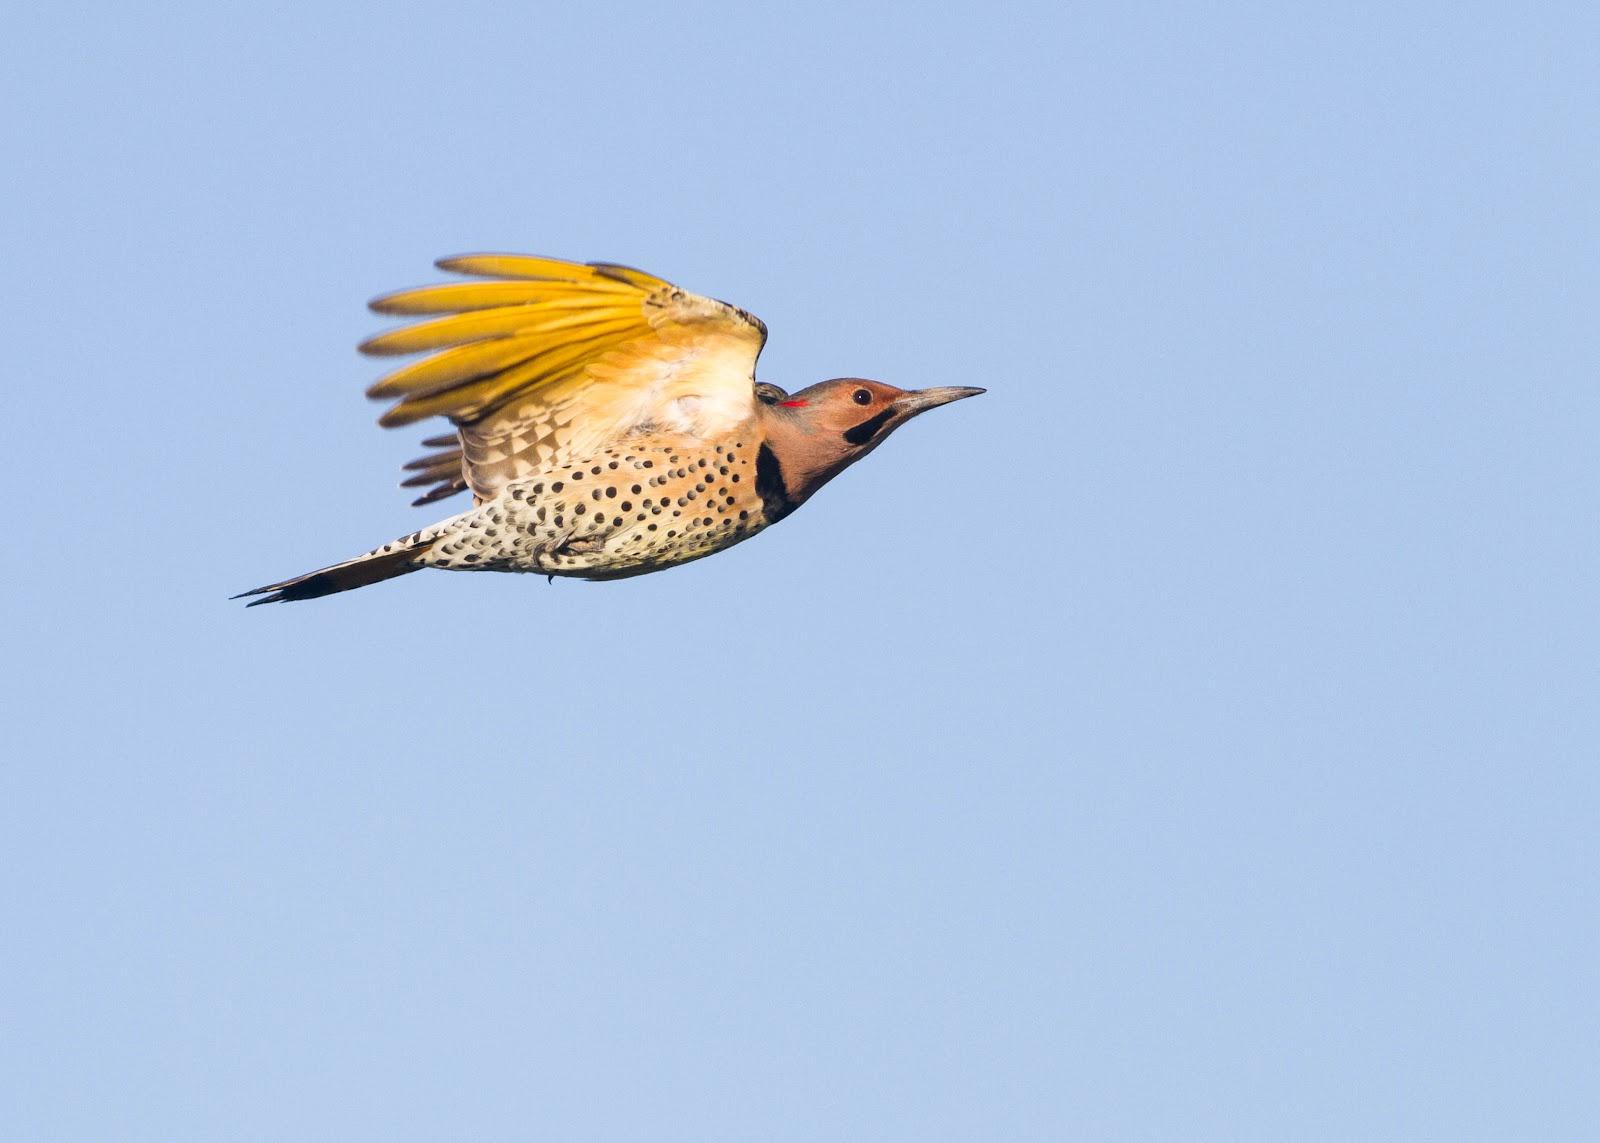 Songbird In Flight Silhouette